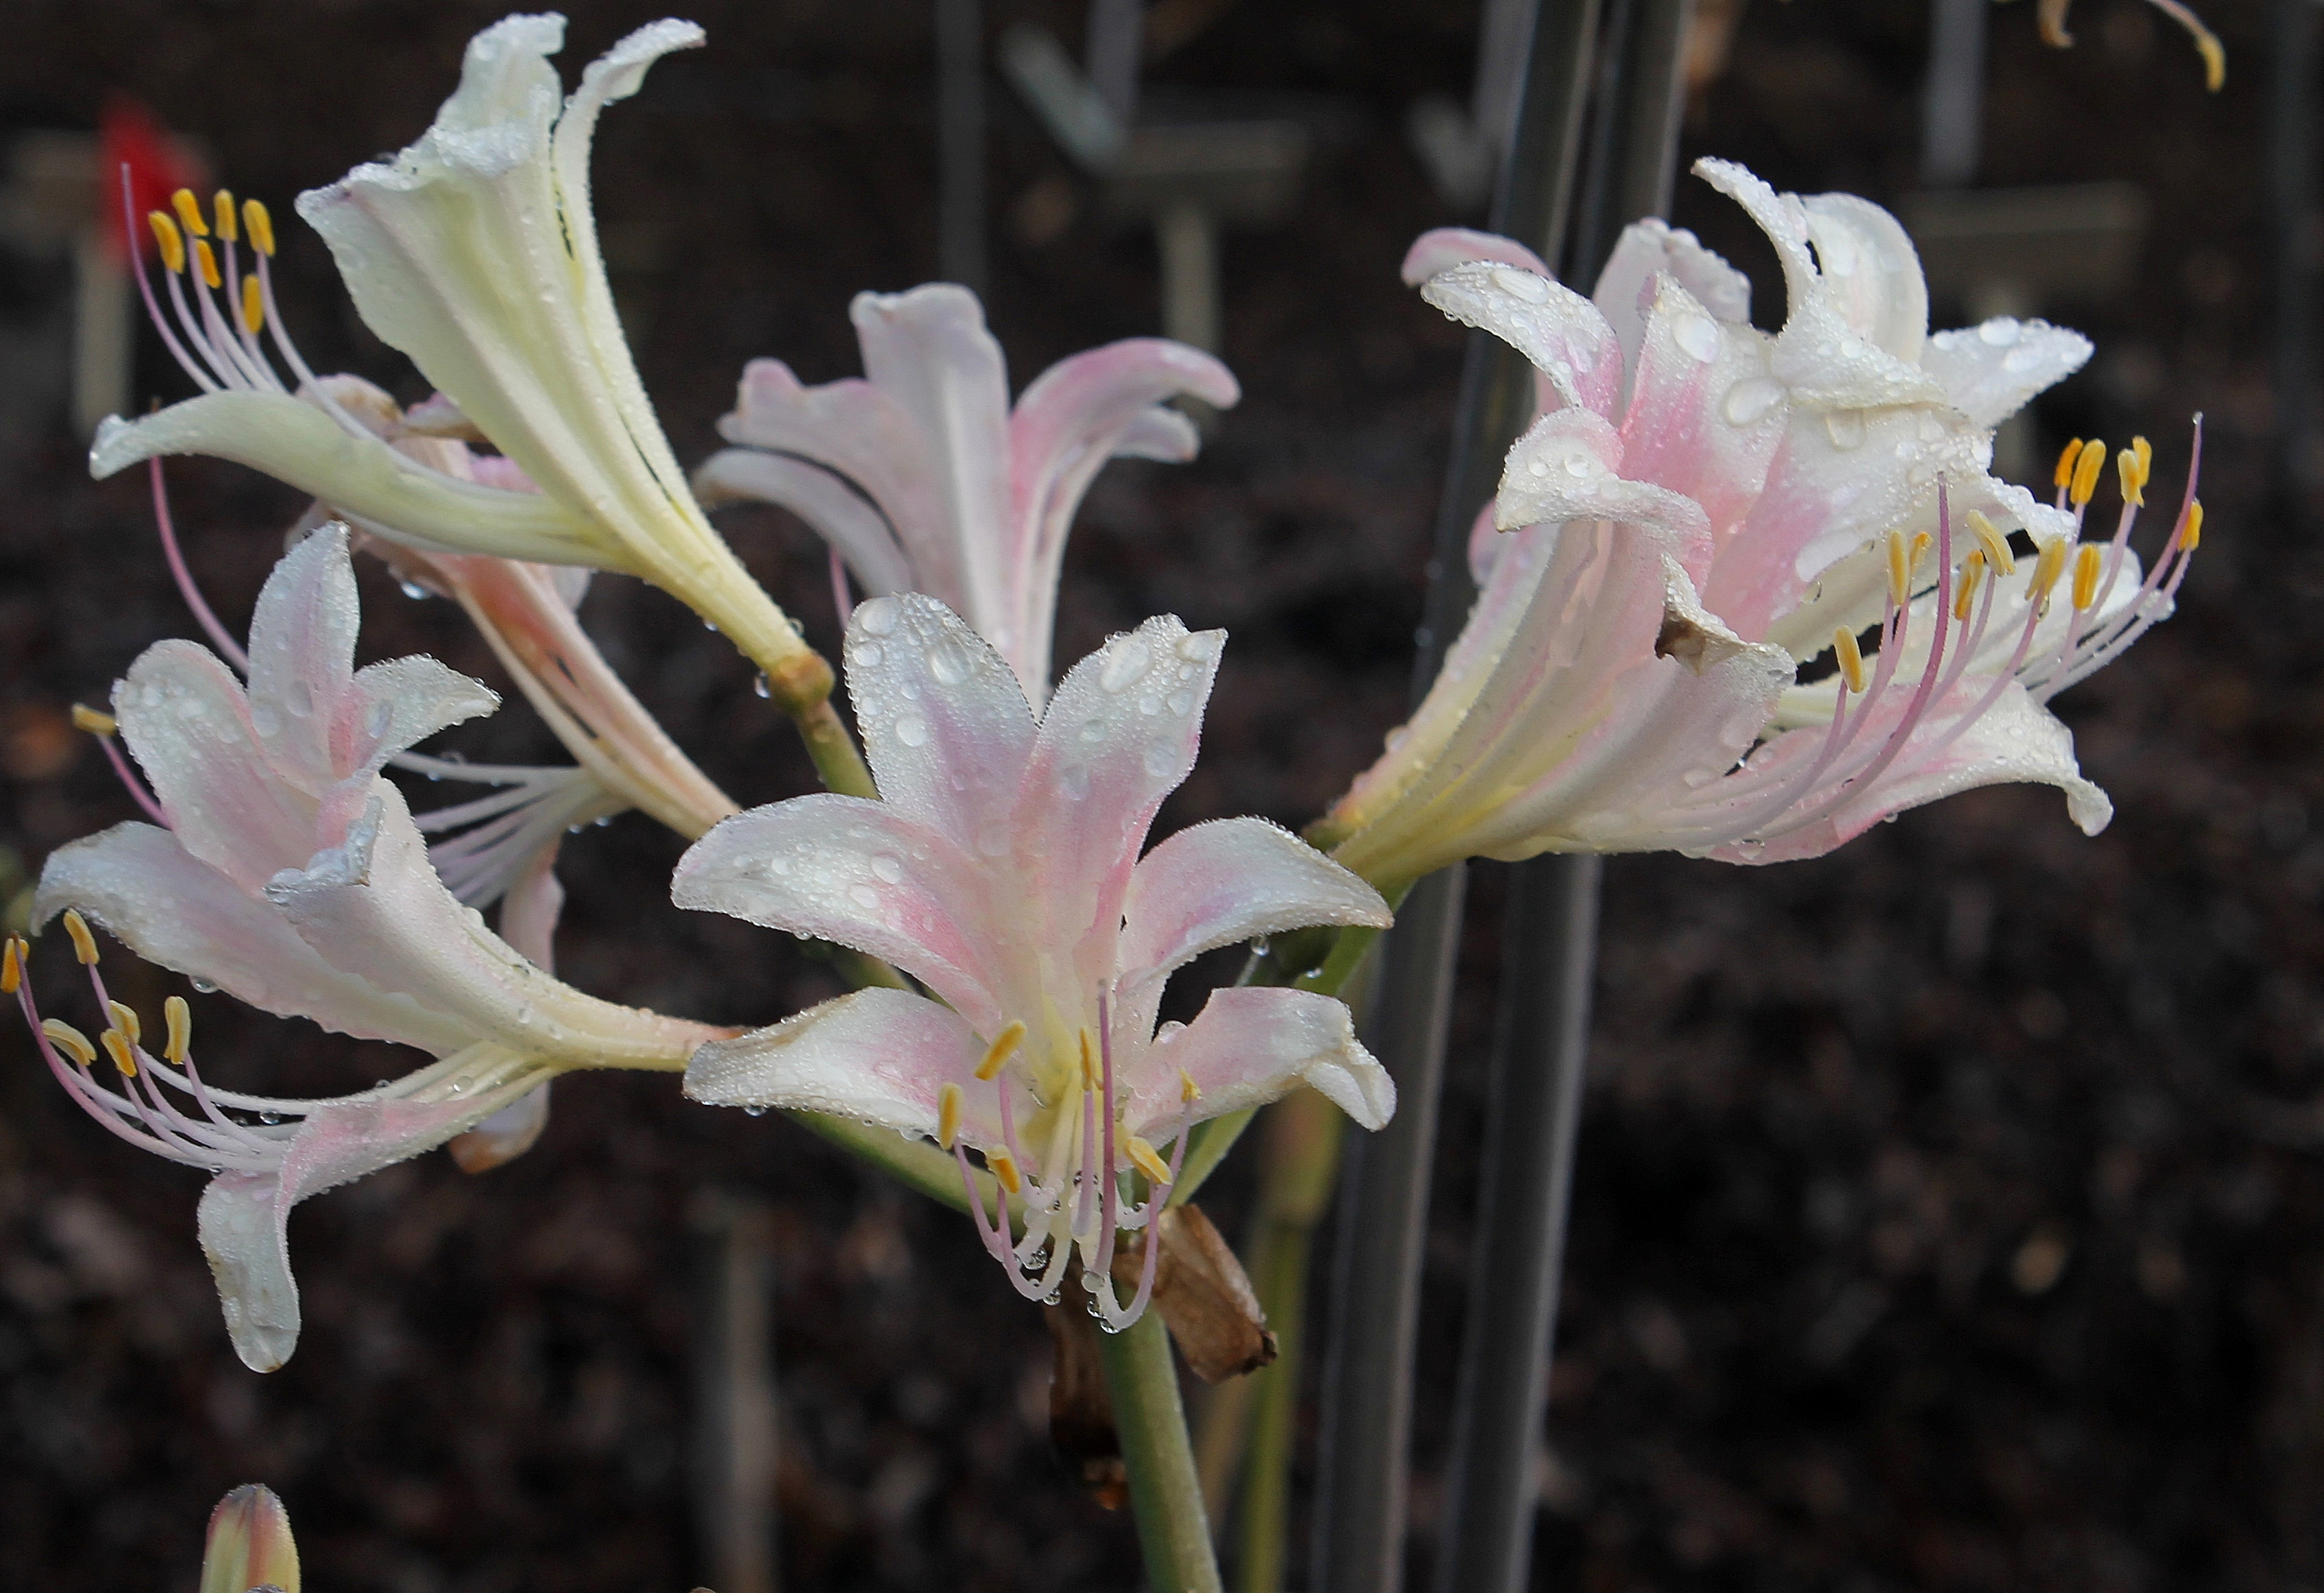 Lycoris x sprengensis 'September Cream Beauty' - a Komoriya Nursery introduction of a cross of Lycoris sprengeri x chinensis